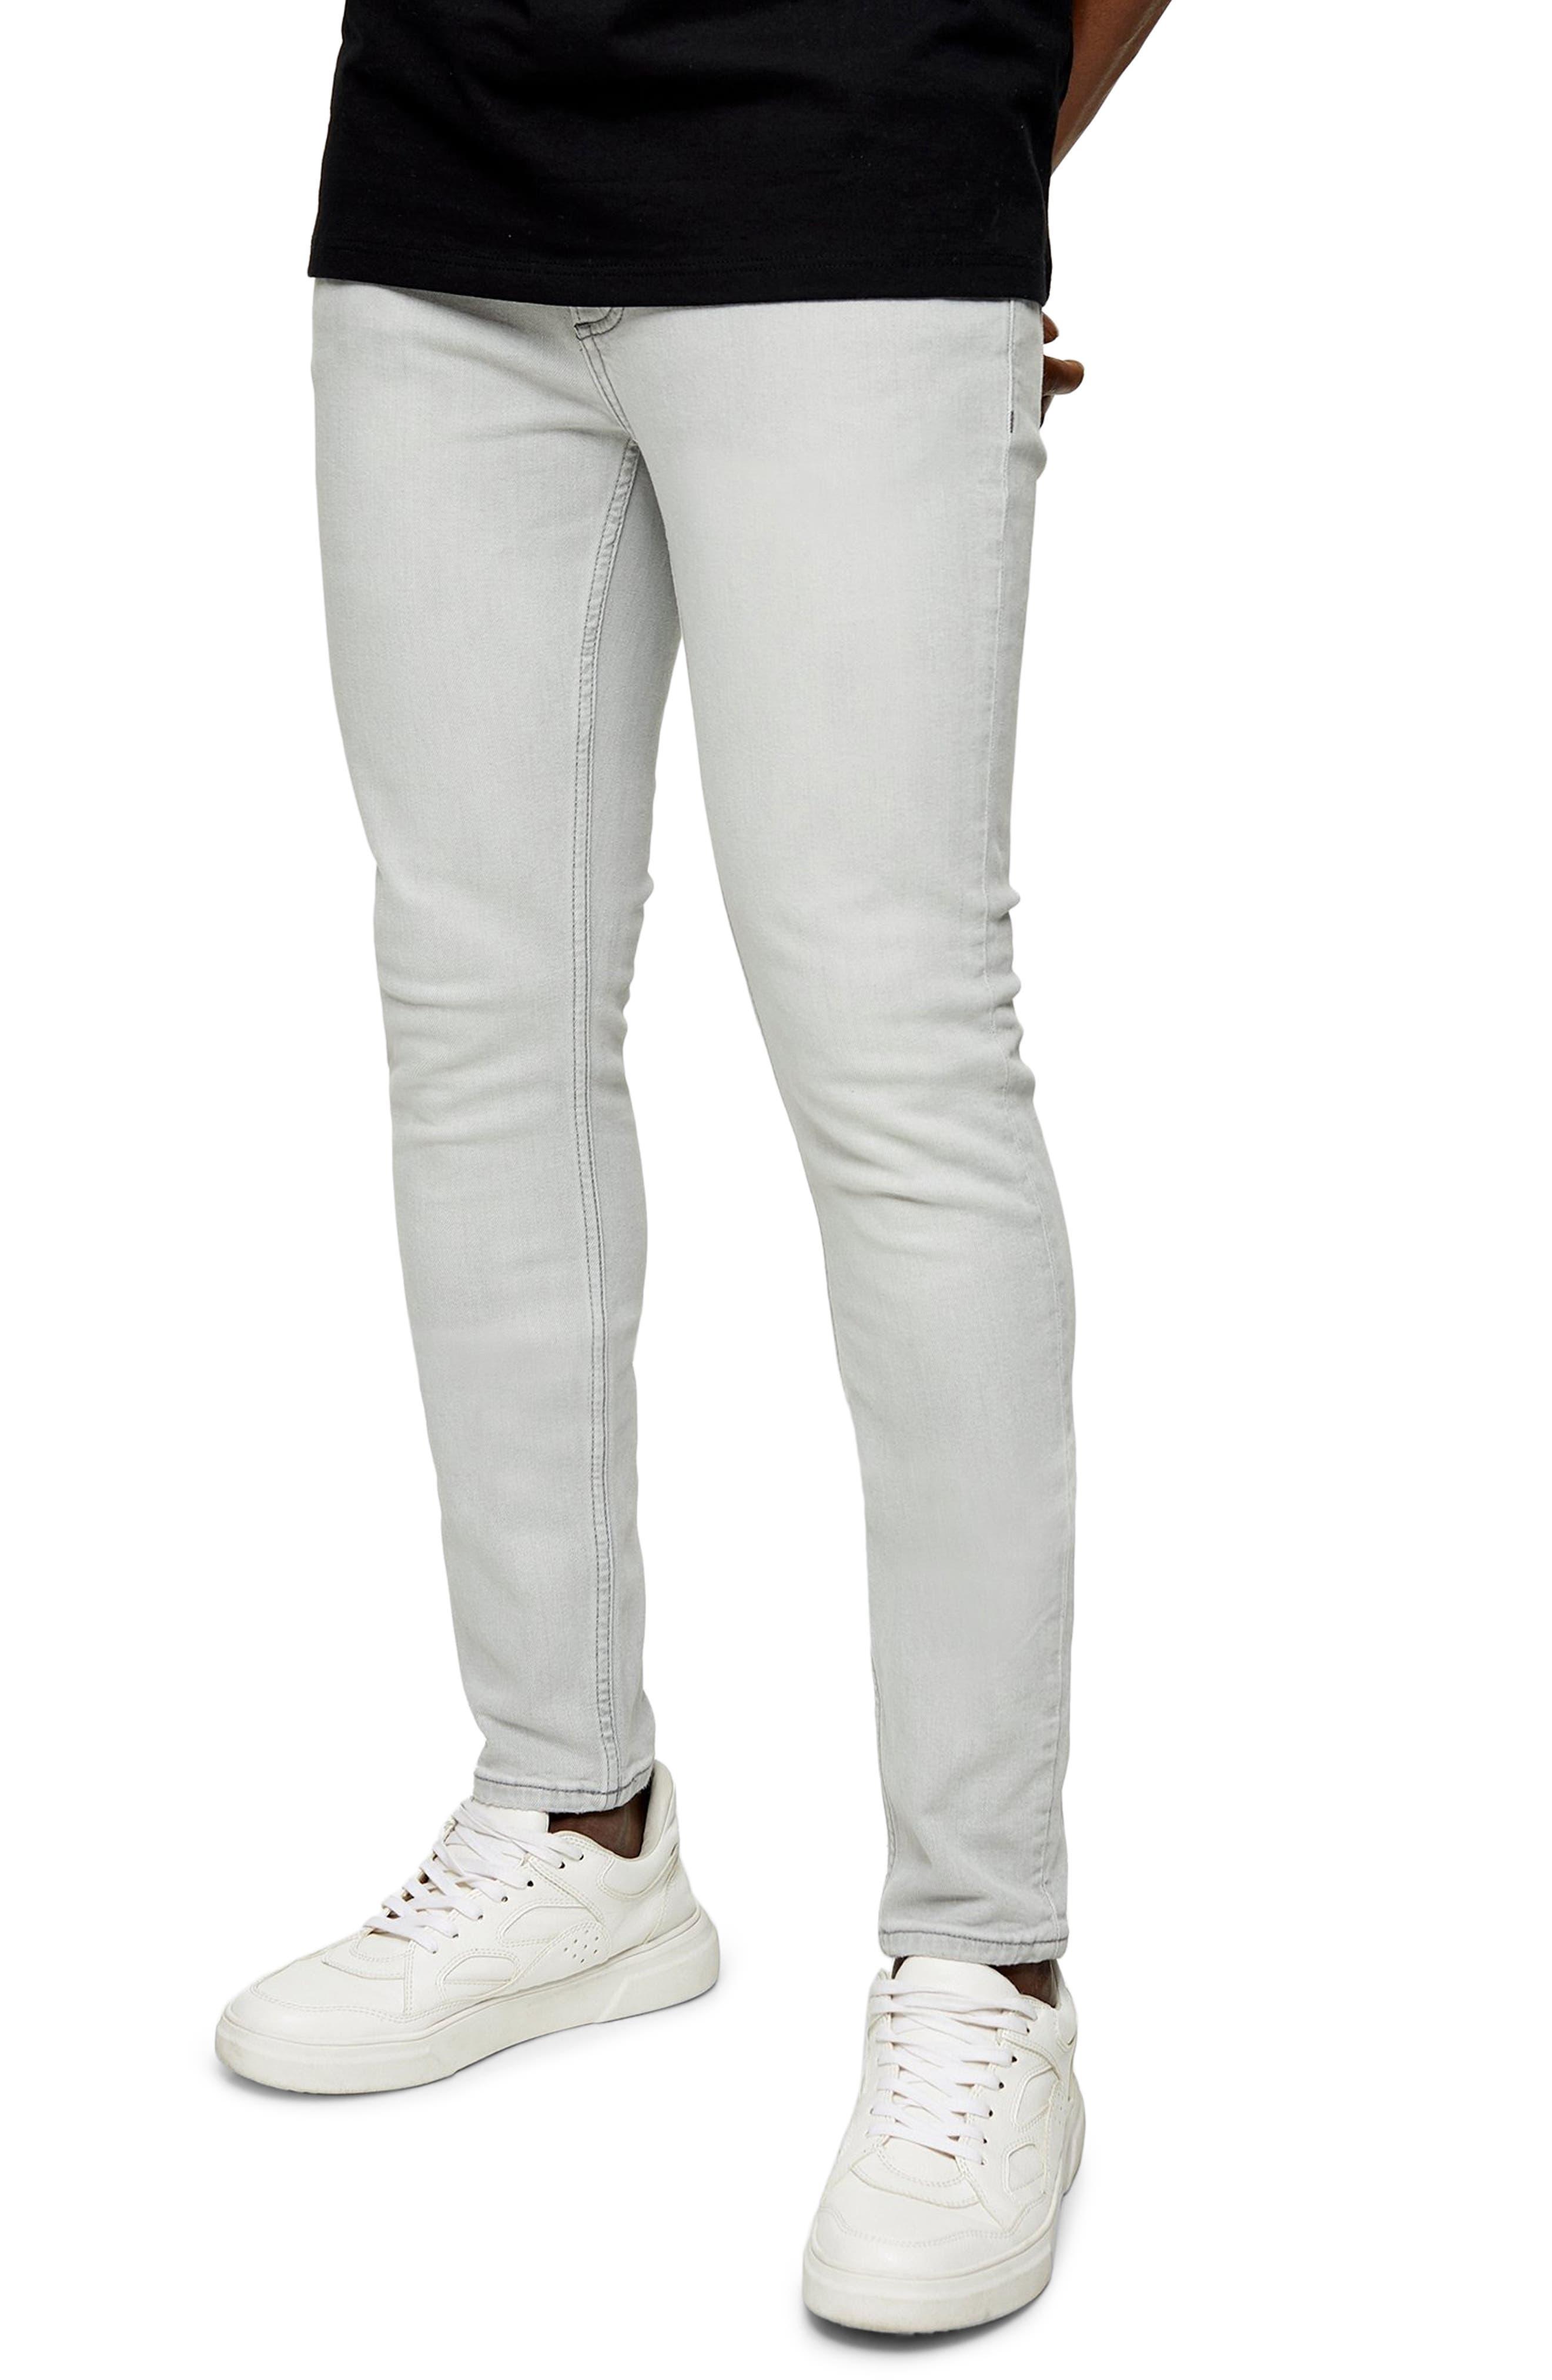 Men's Topman Skinny Jeans,  30 x 30 - Grey